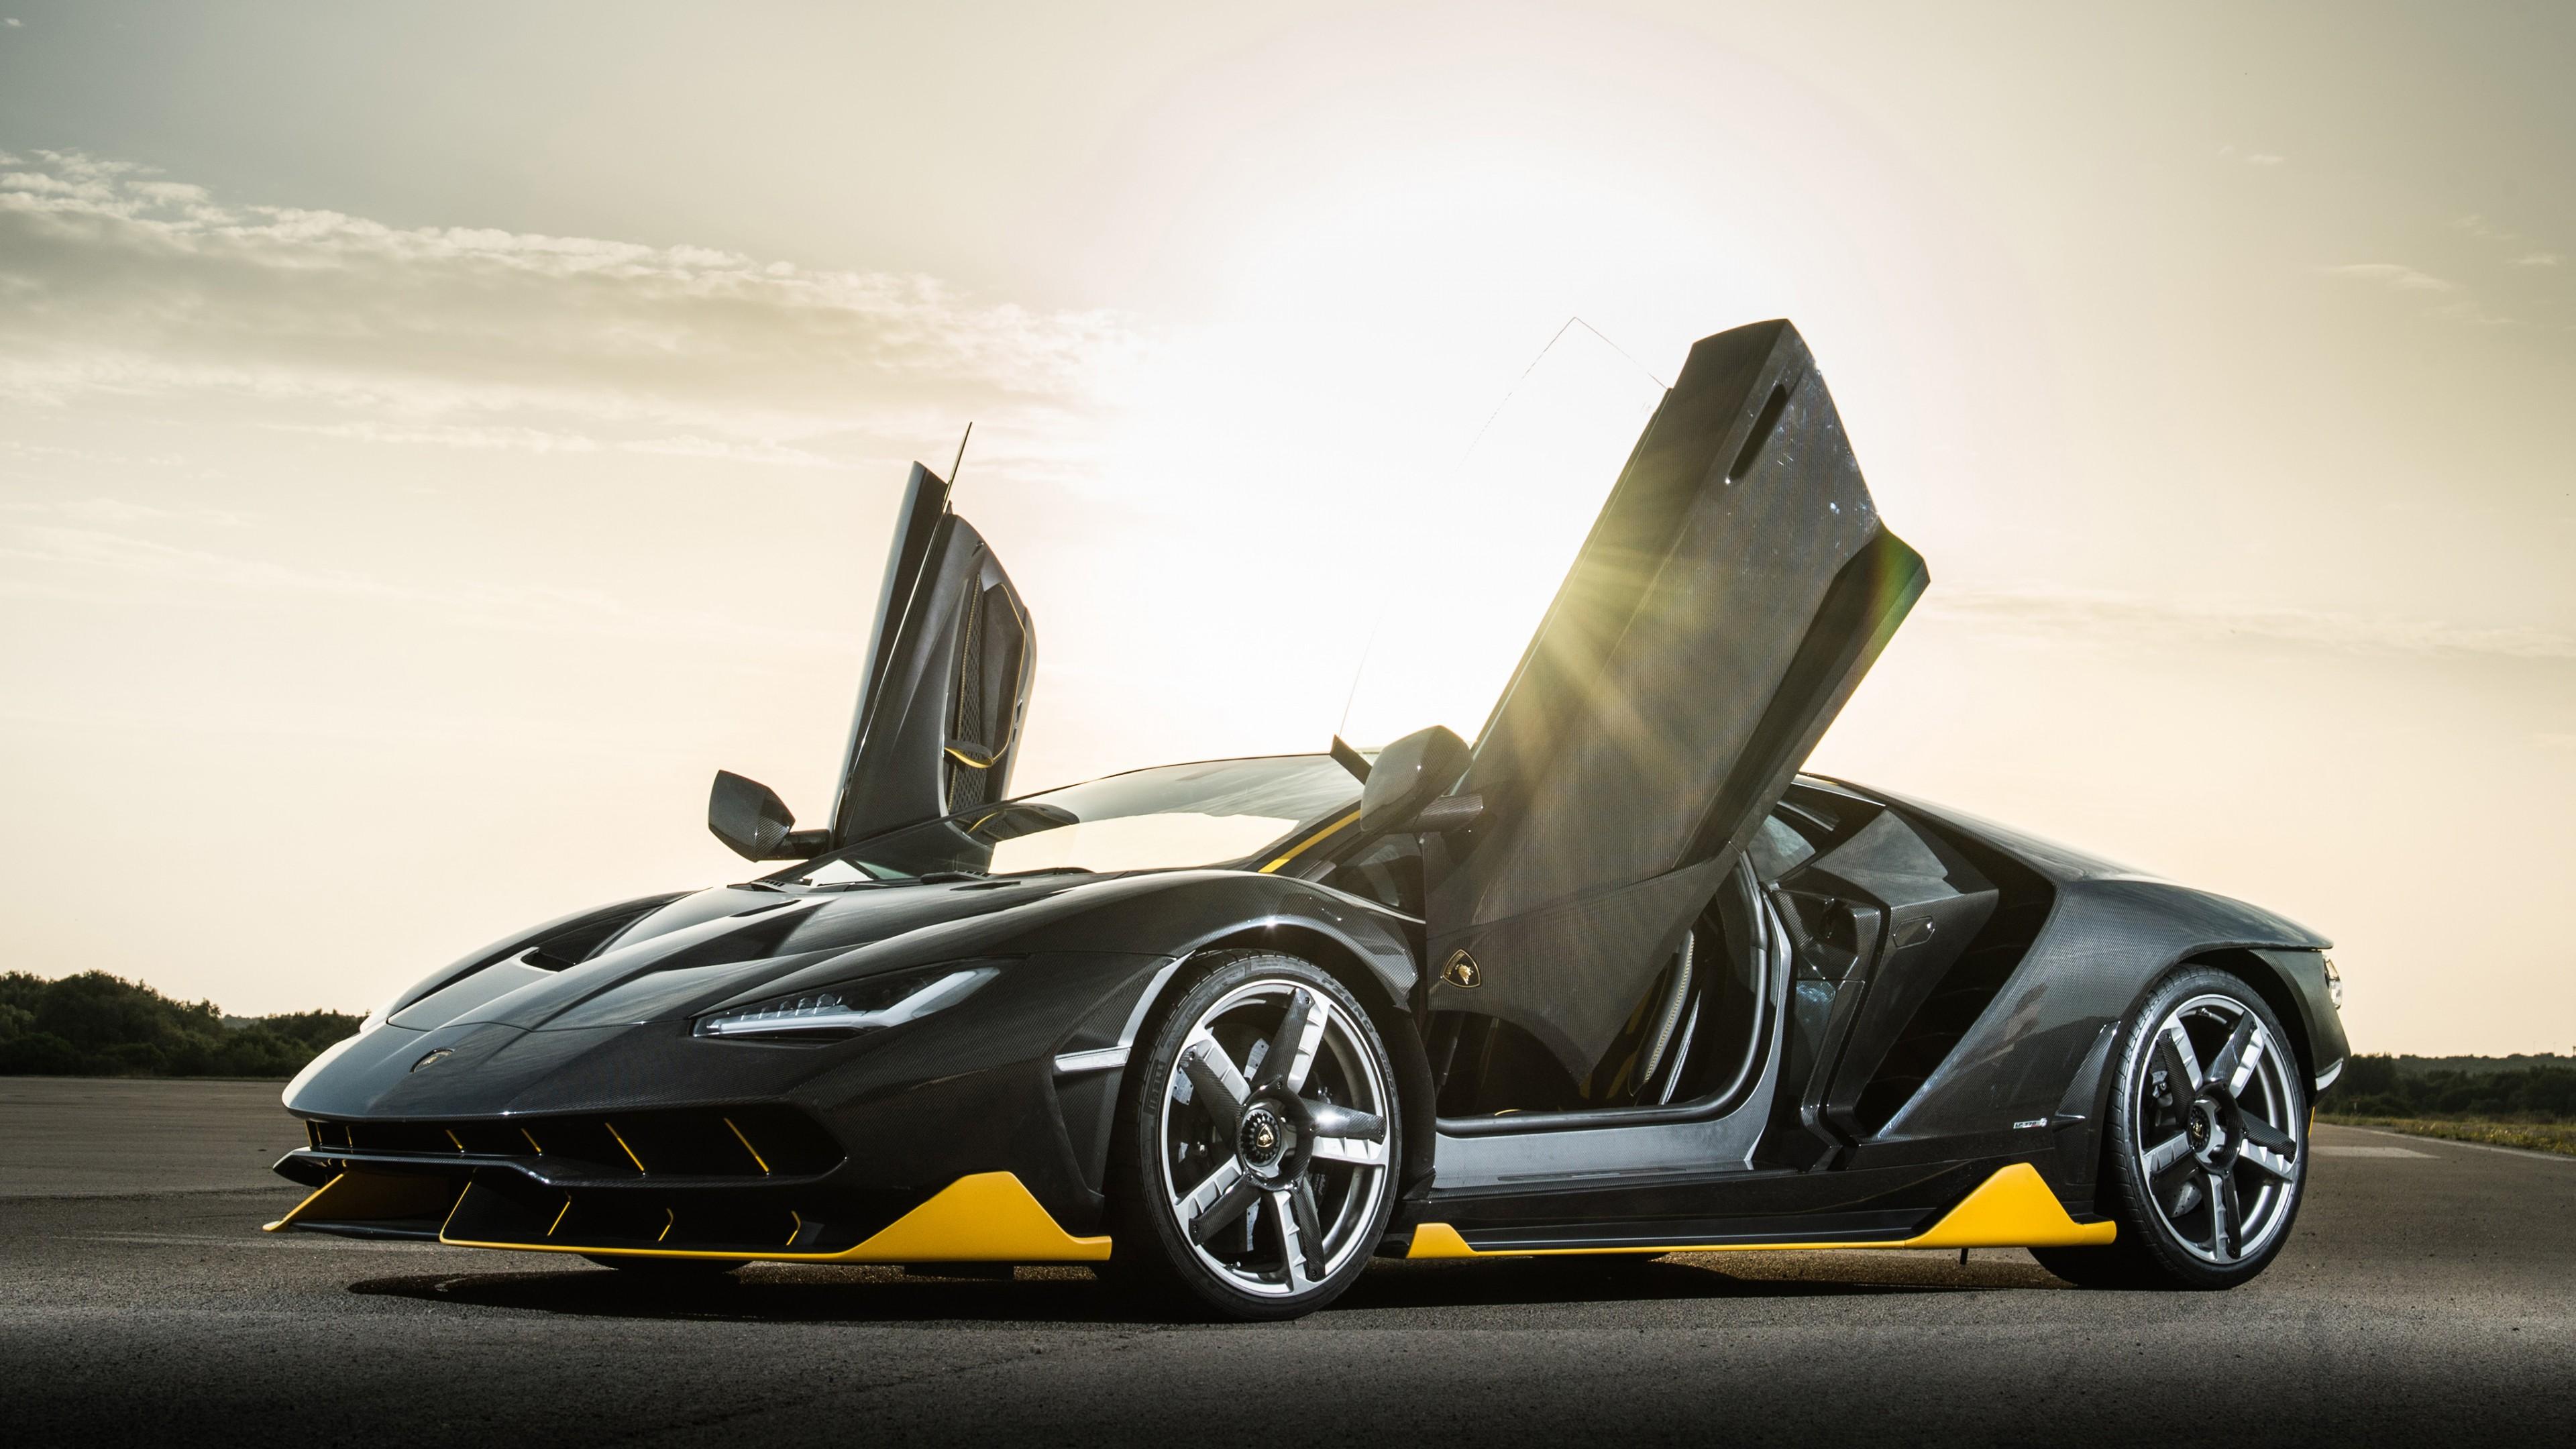 Wallpaper Lamborghini Centenario Coupe Supercar Black